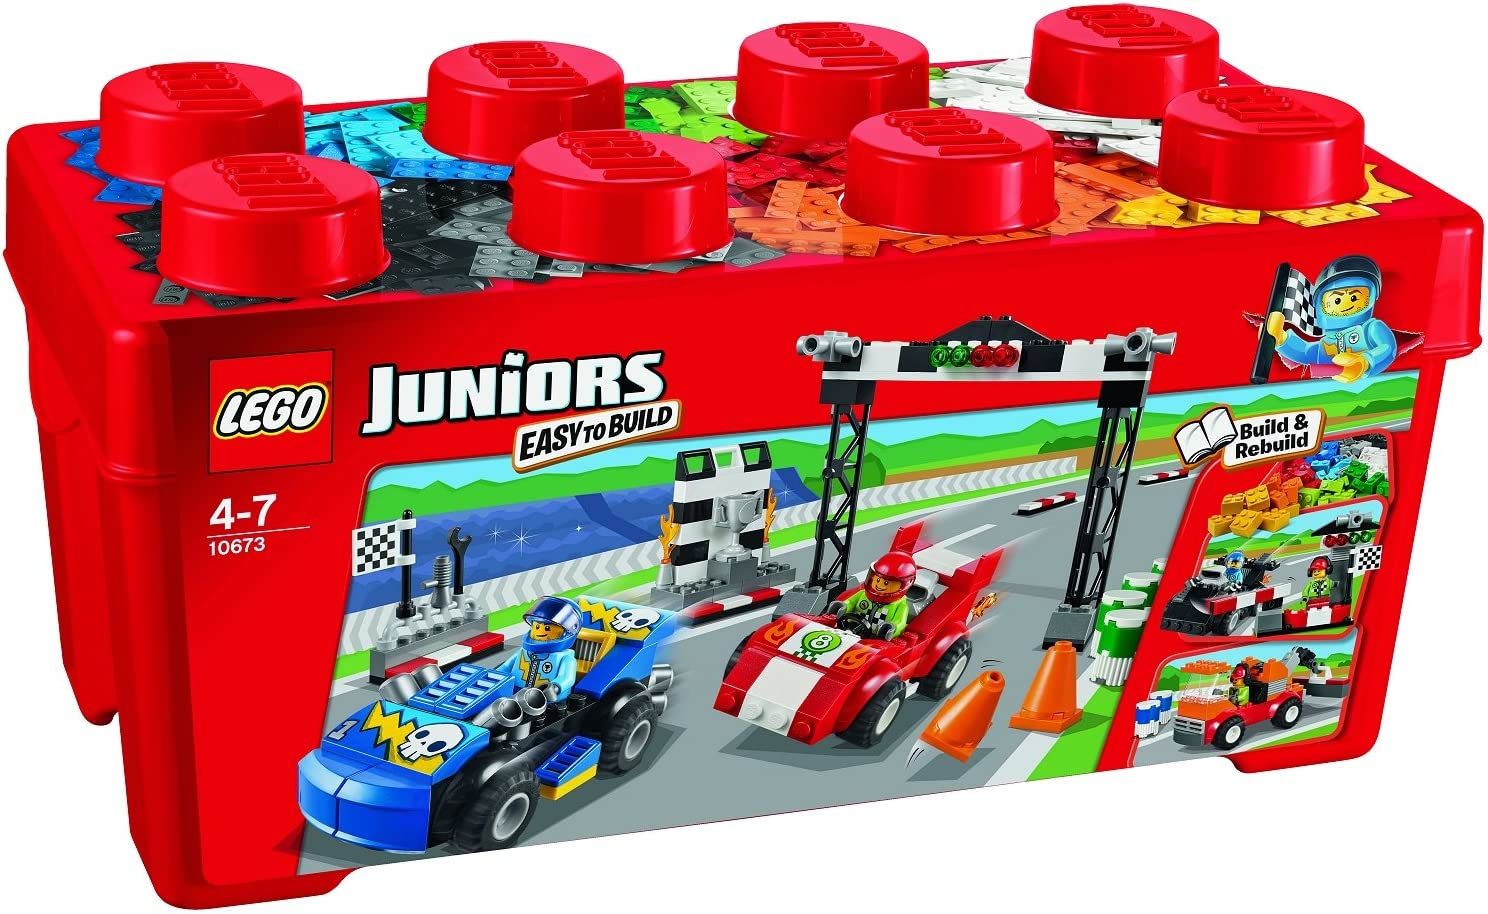 LEGO Juniors 10673 - Jeu De Construction Rallye LEGO